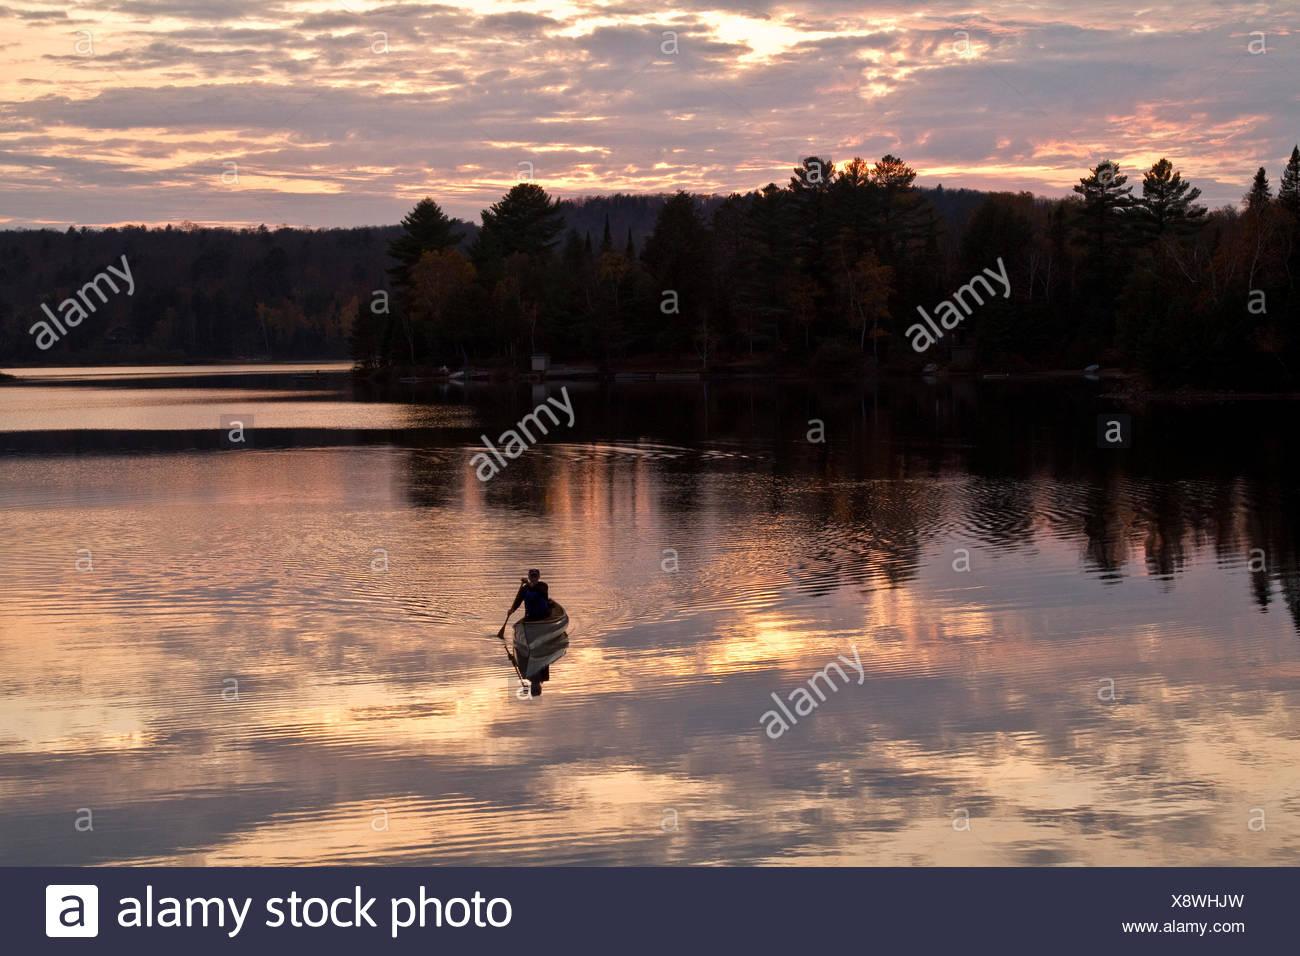 Young man paddles solo canoe on Oxtongue Lake, Muskoka, Ontario. - Stock Image